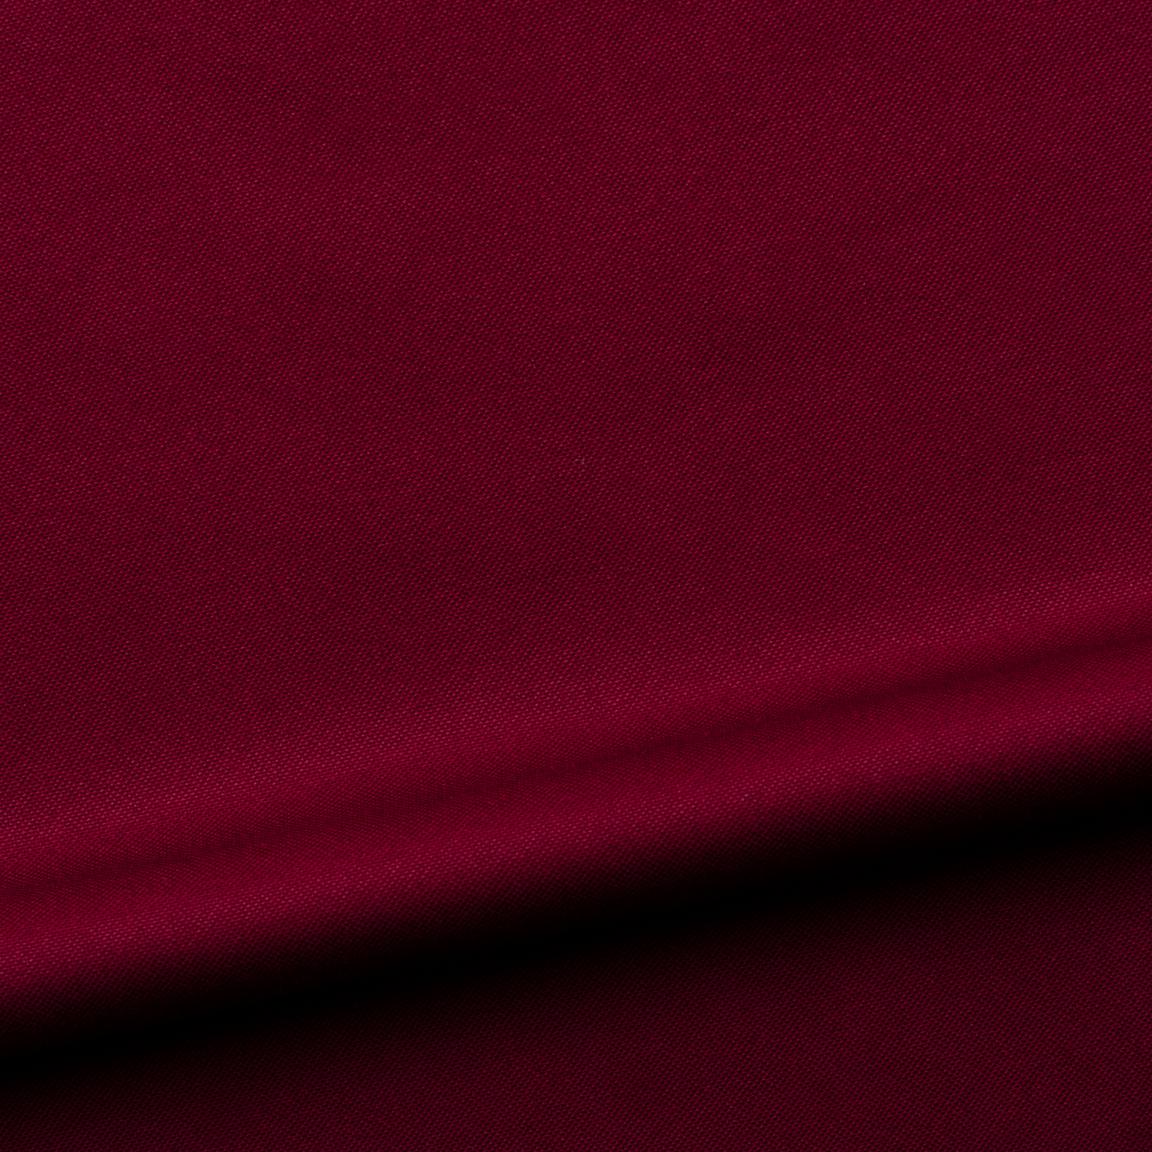 Braga, dark red